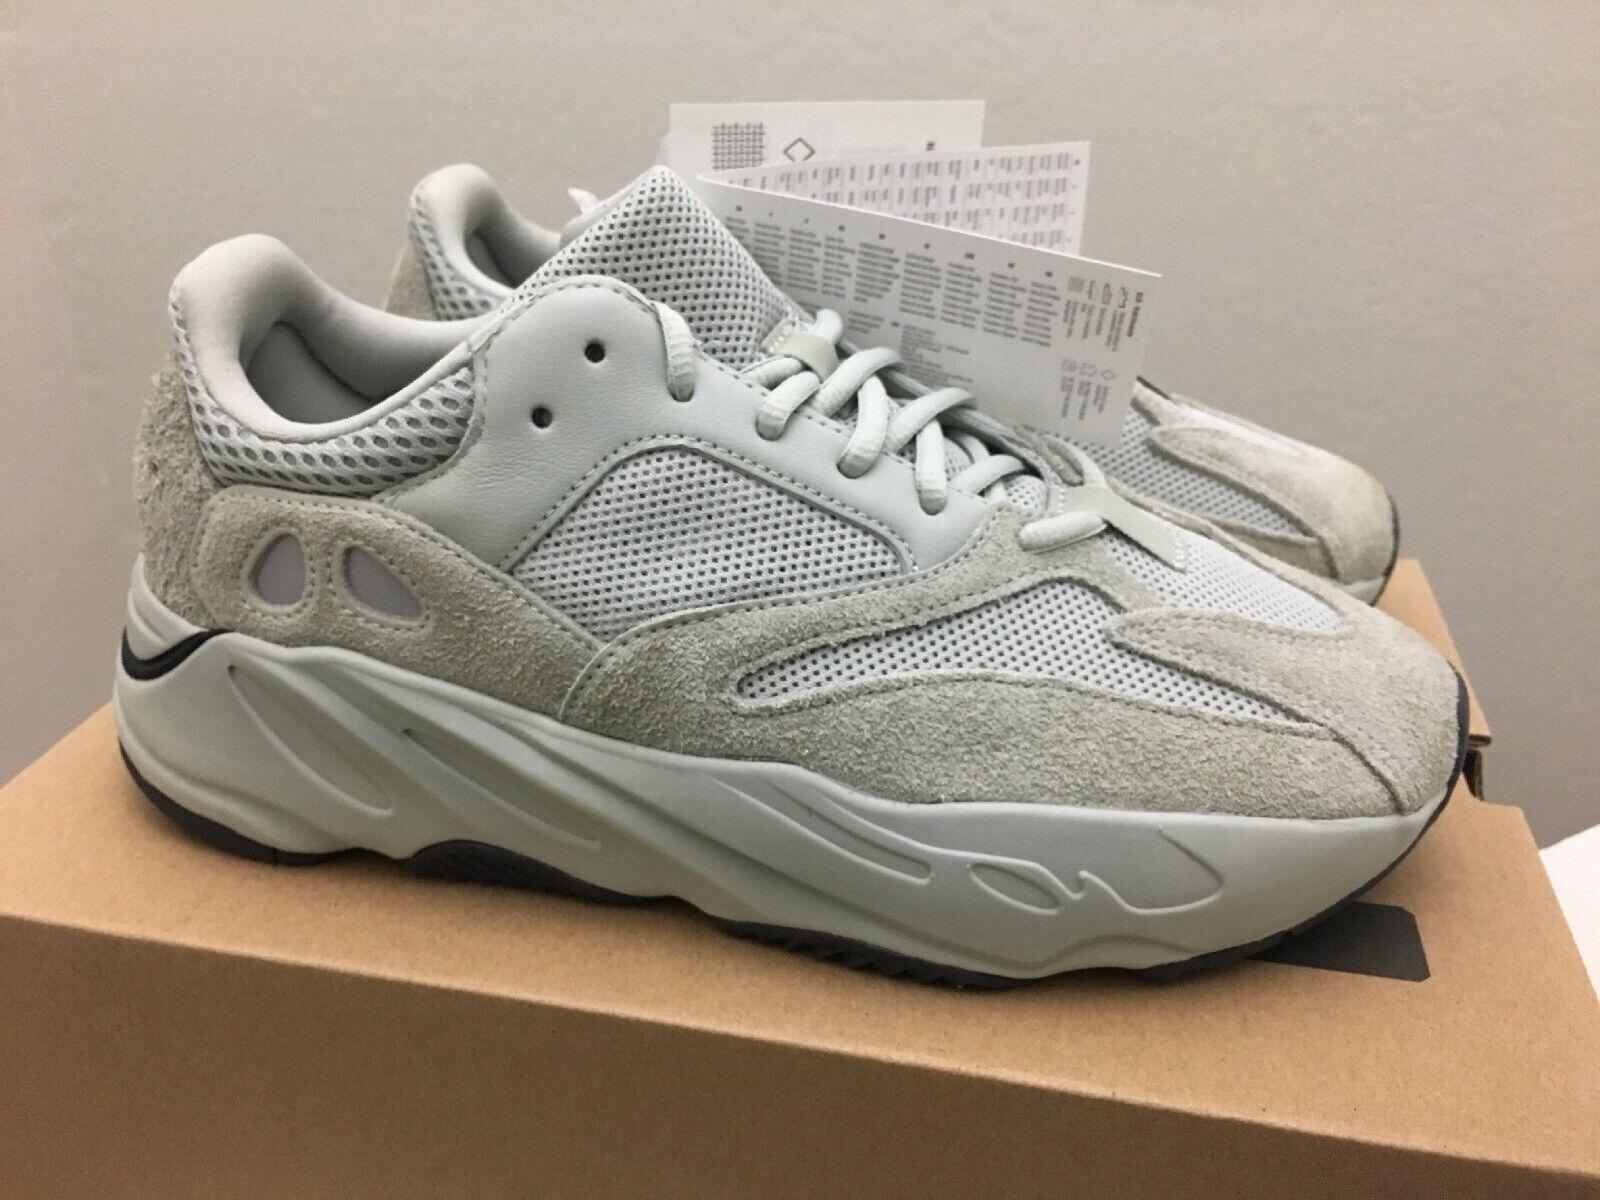 Adidas Yeezy Boost 700 Salt Grey Mens 9